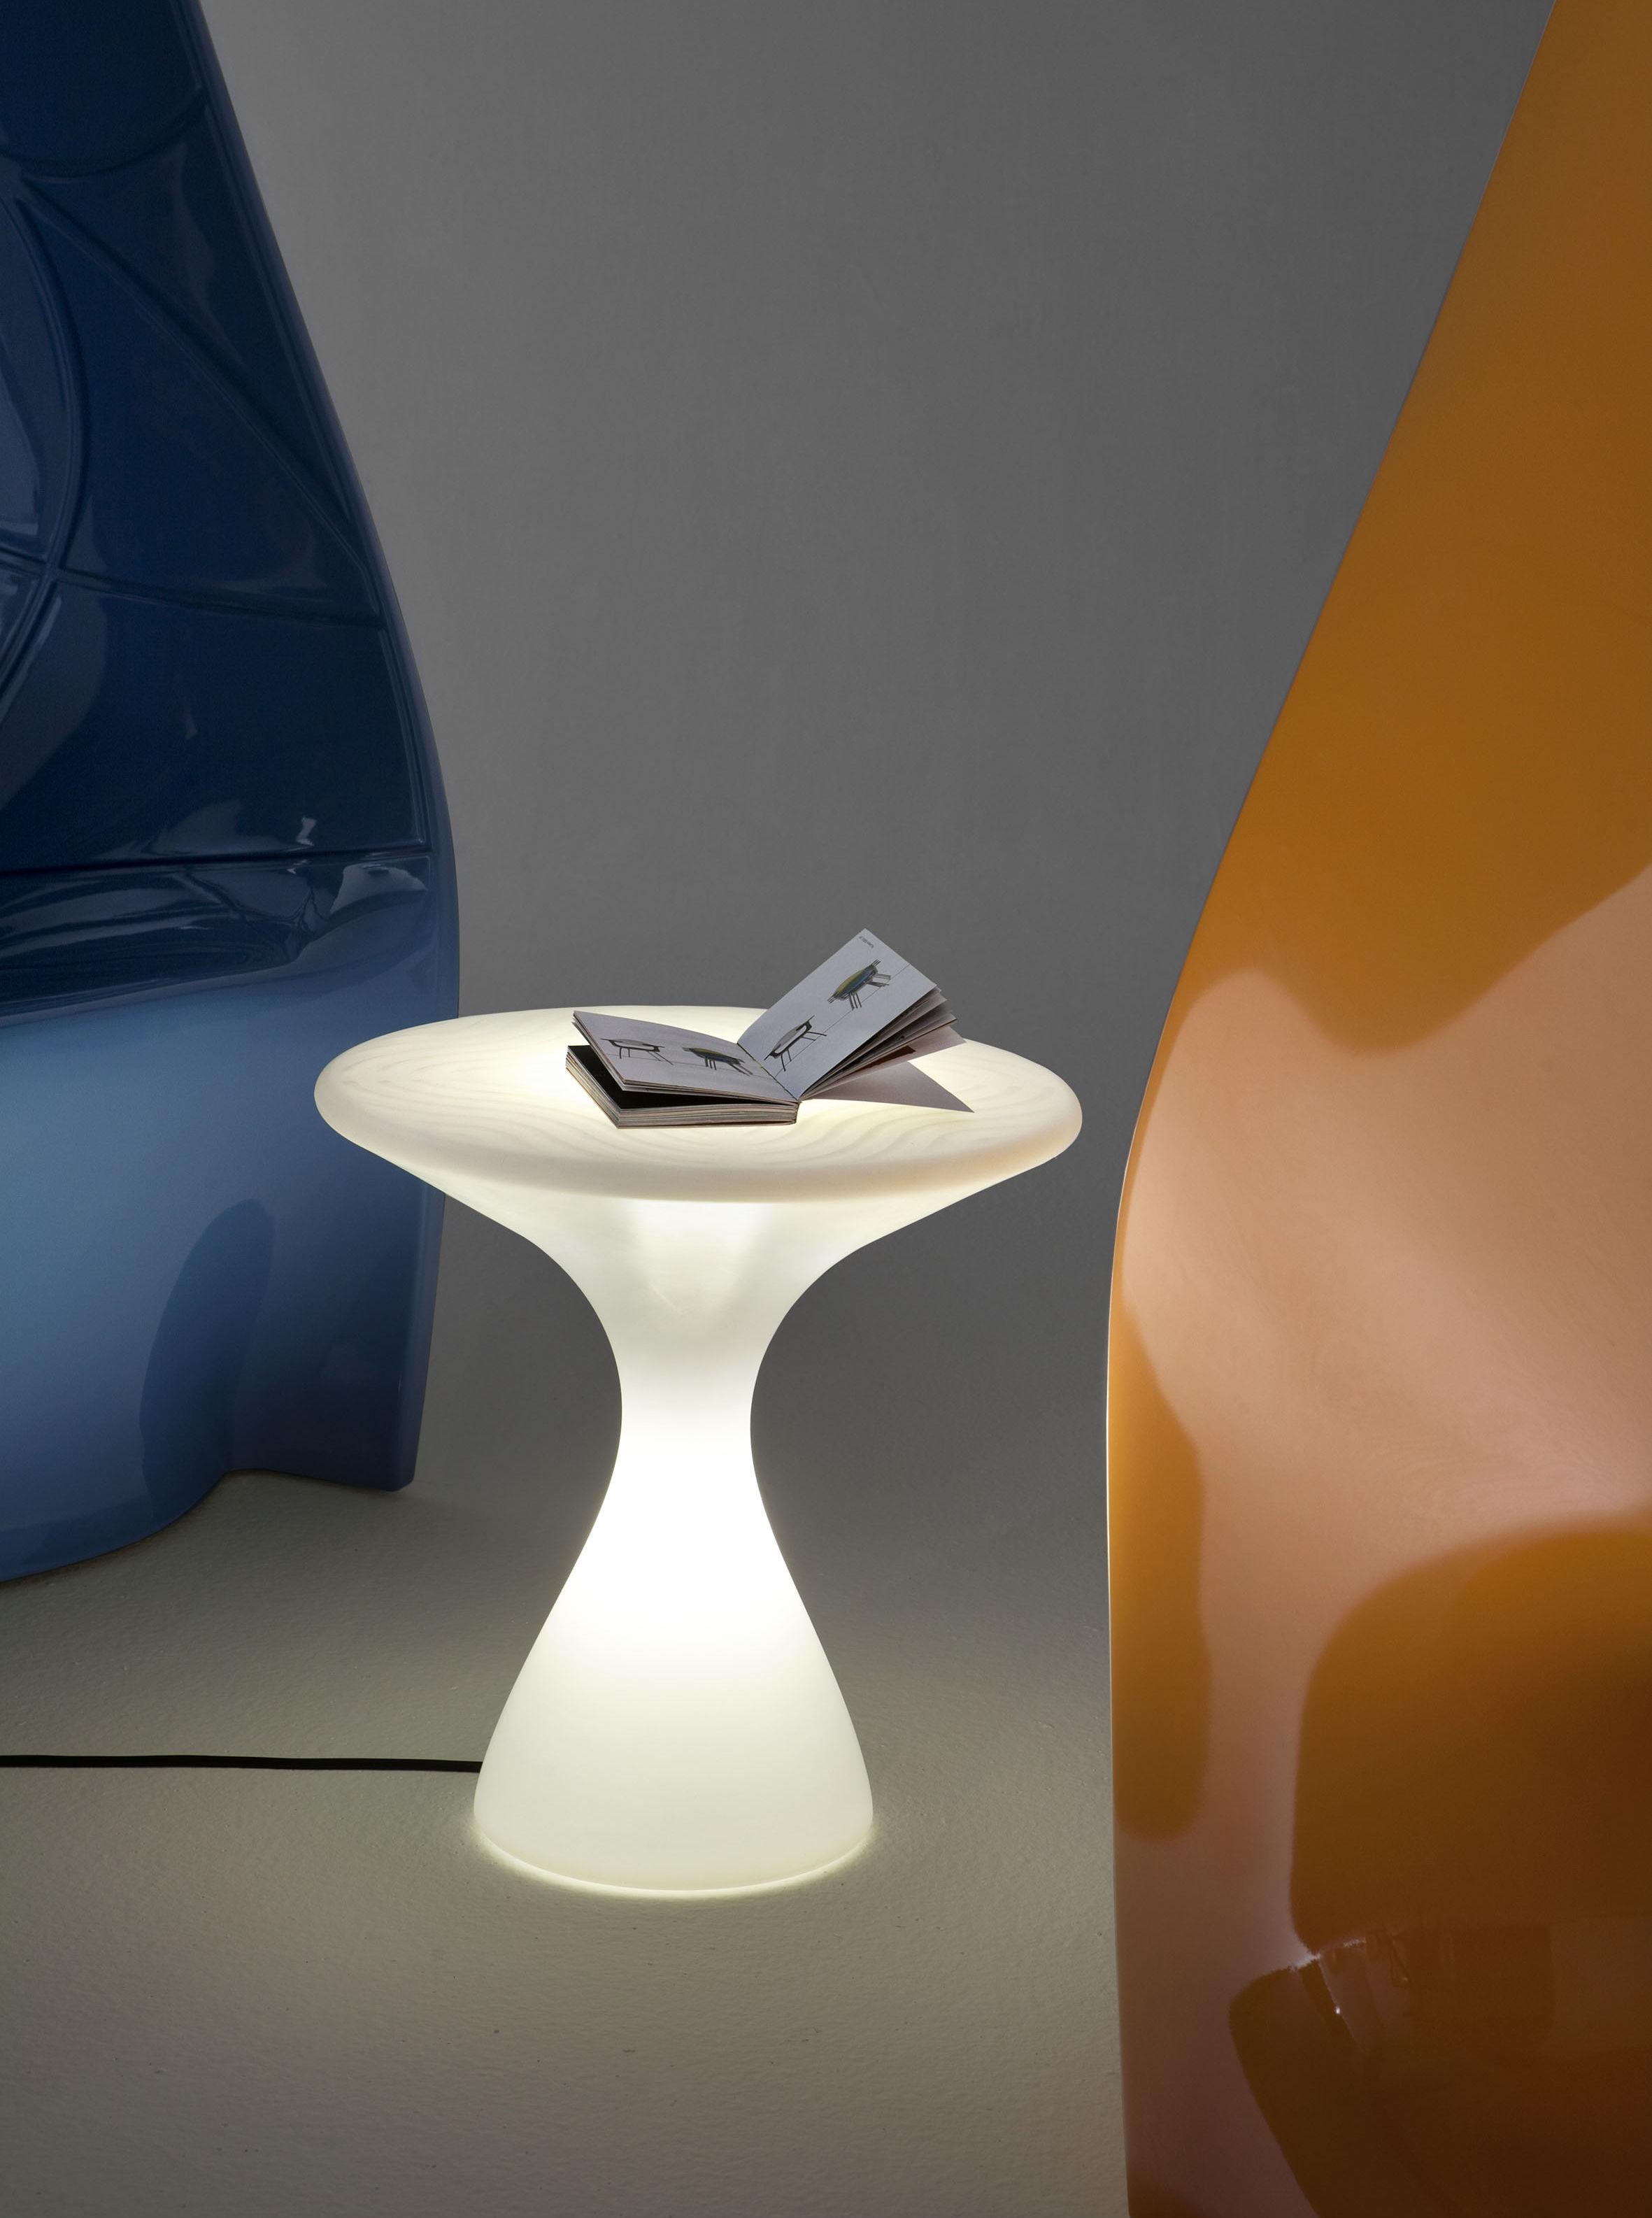 table basse lumineuse kissino h 45 cm version led sans c ble blanc opalin clairage led. Black Bedroom Furniture Sets. Home Design Ideas